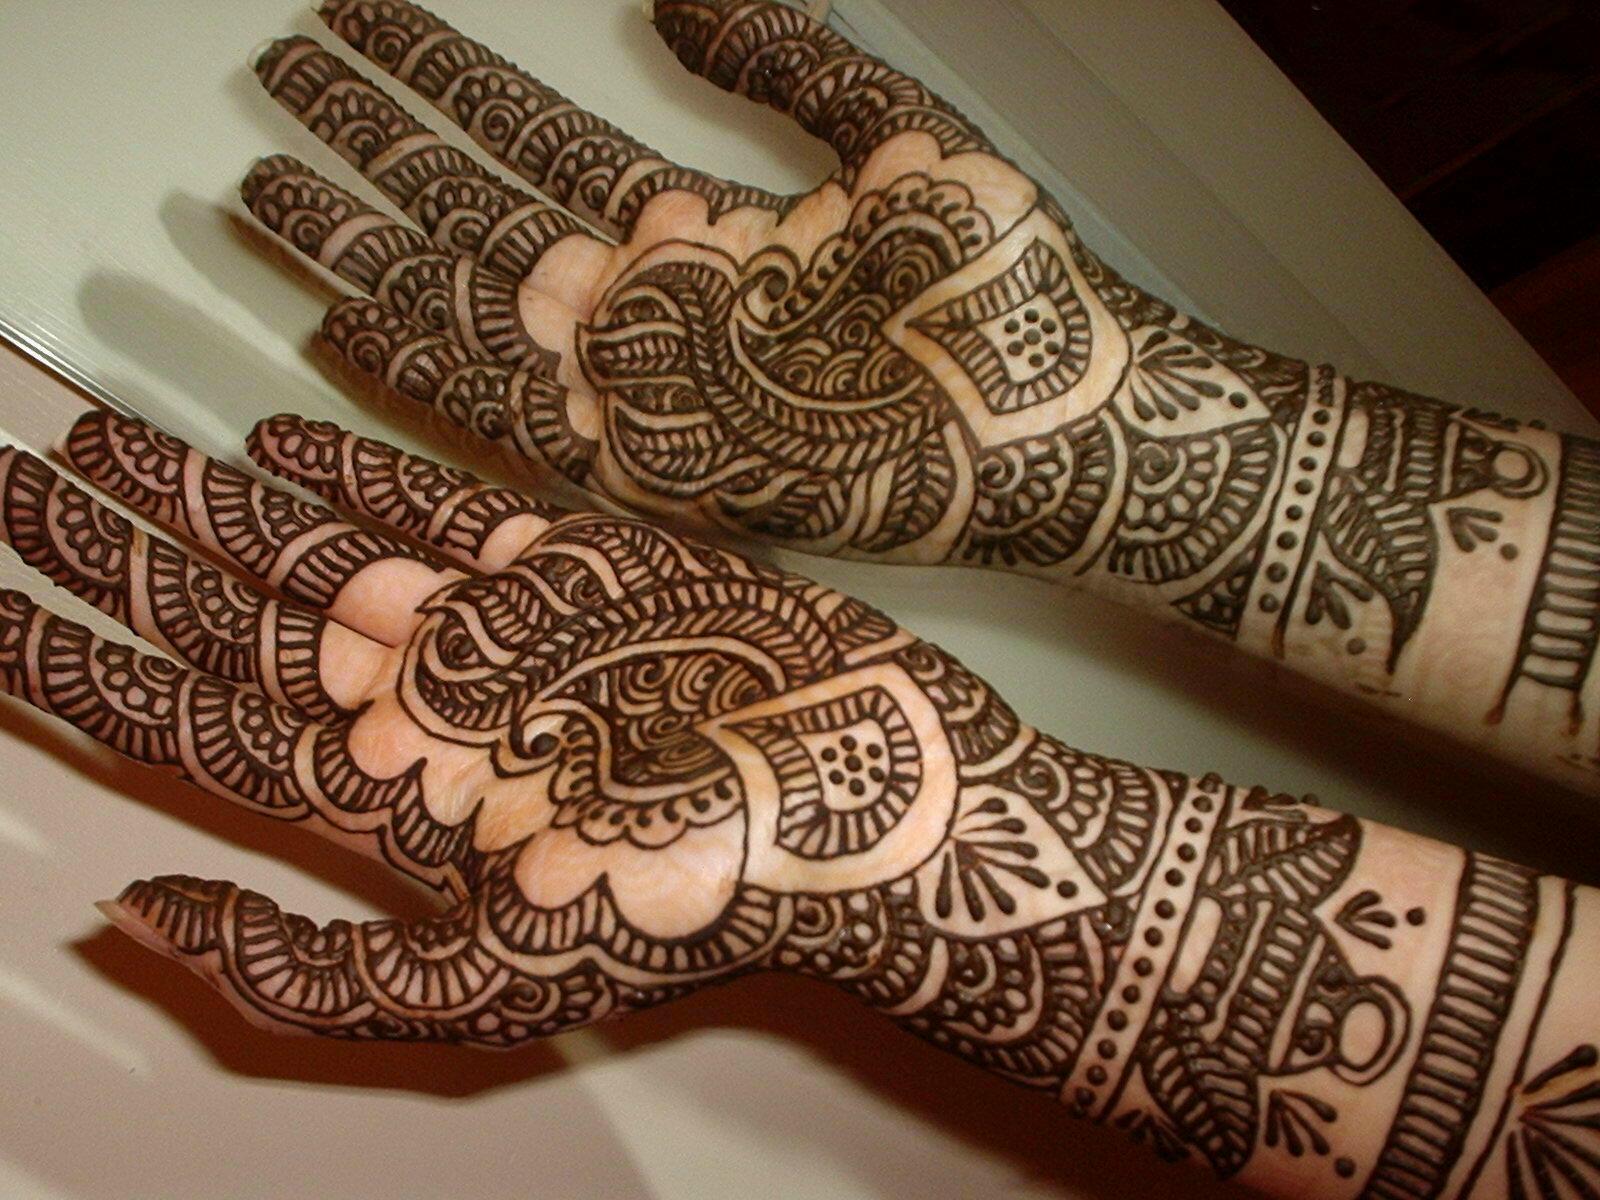 Mehndi Tattoo Hd : Henna tattoo for hands ~ design